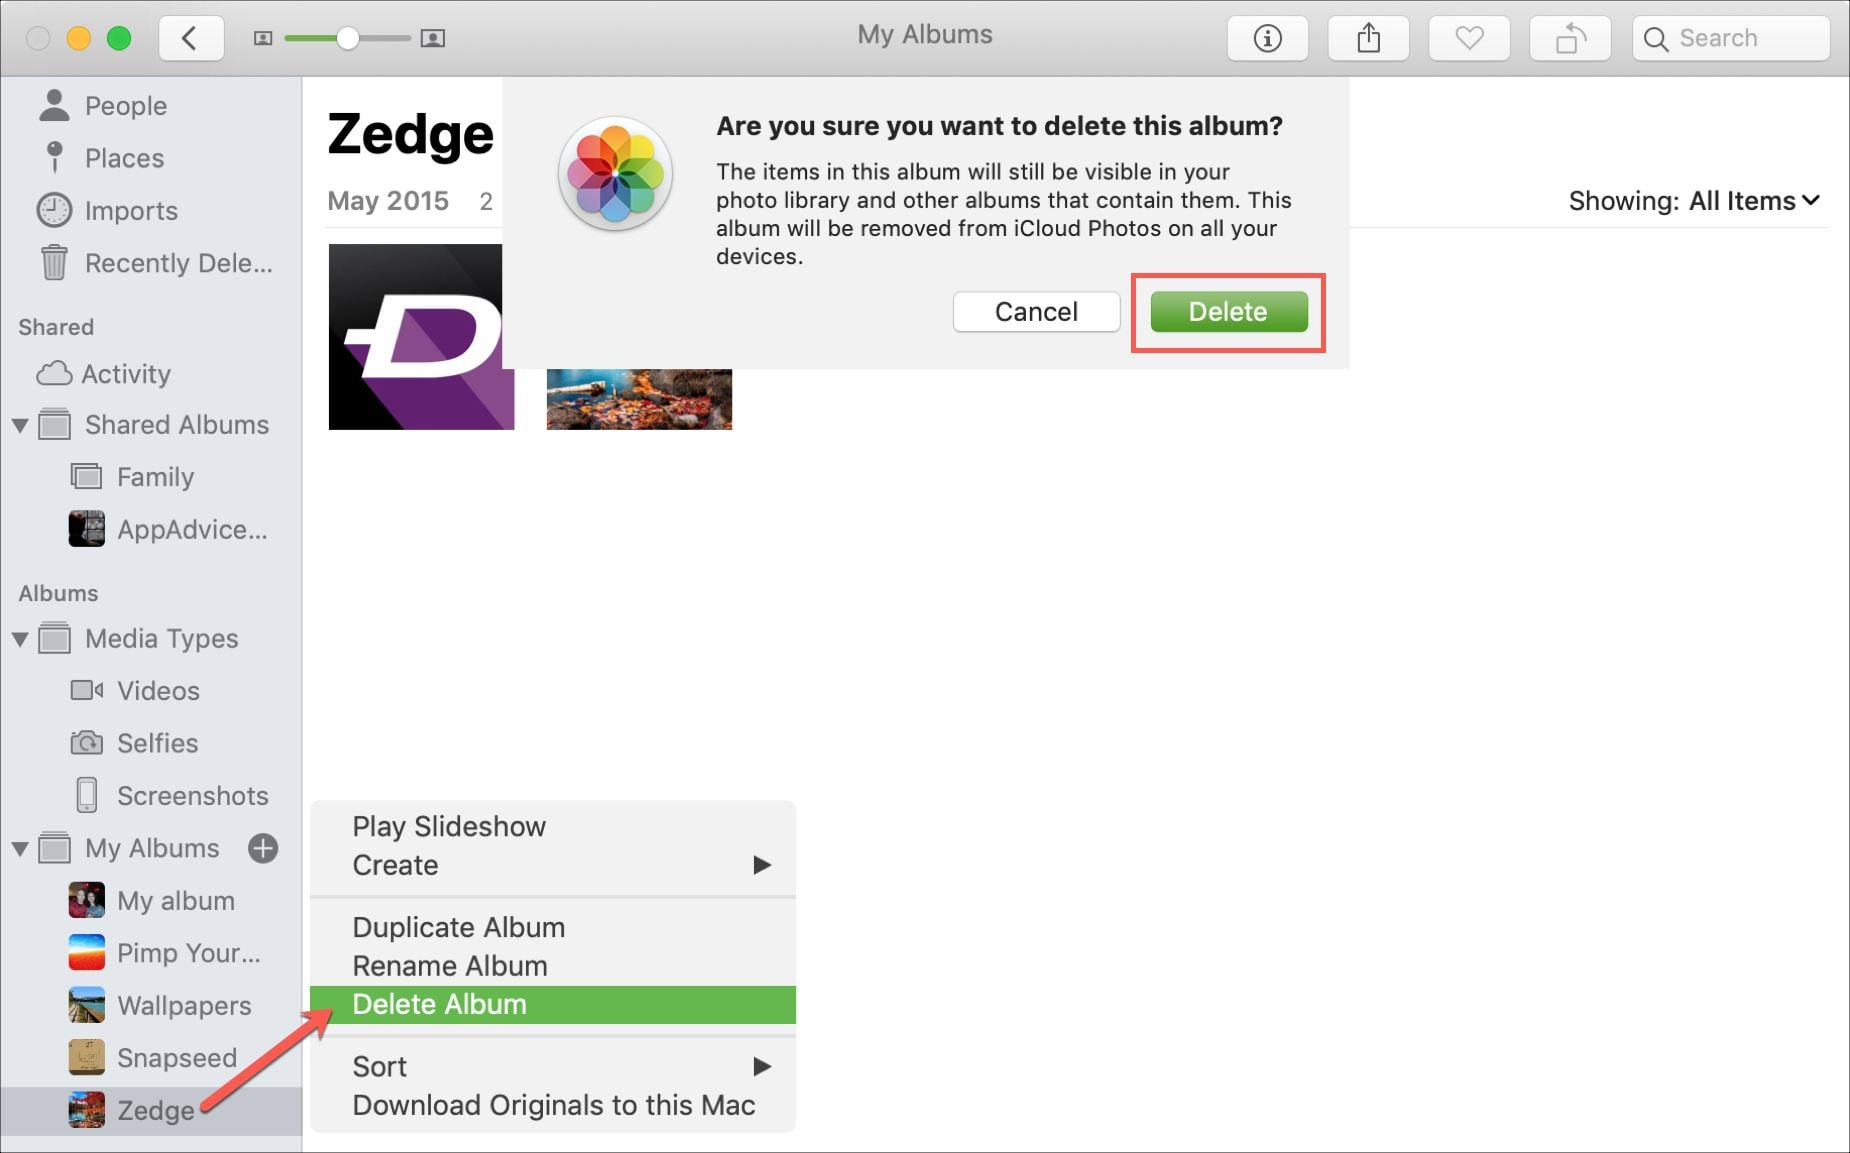 delete photo album on a mac using photos app